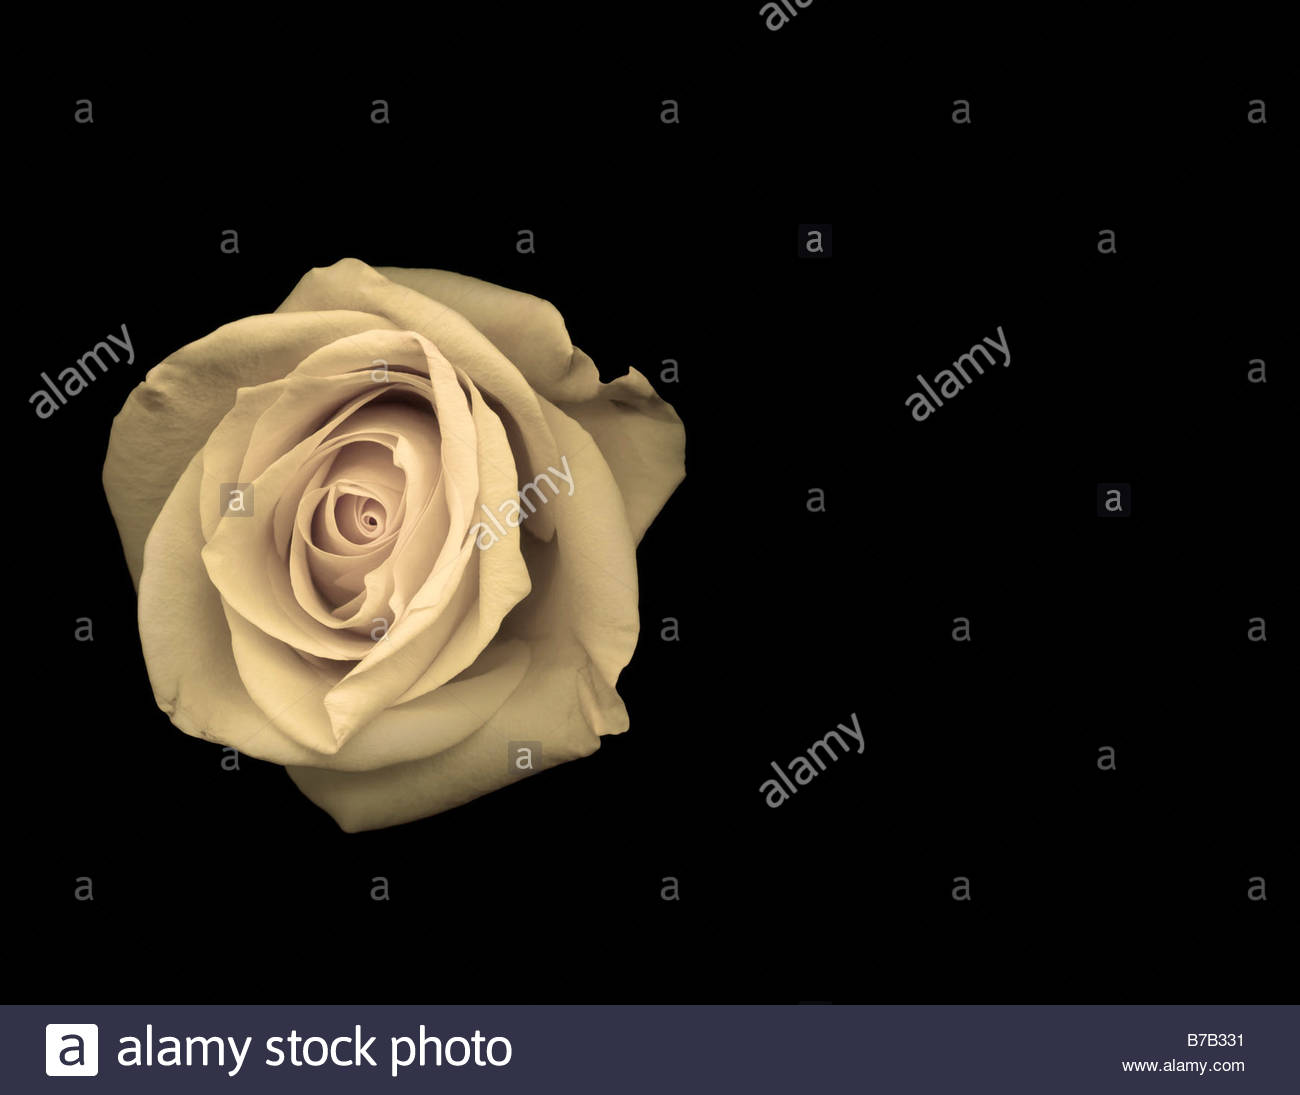 Studioaufnahme von rose Stockbild